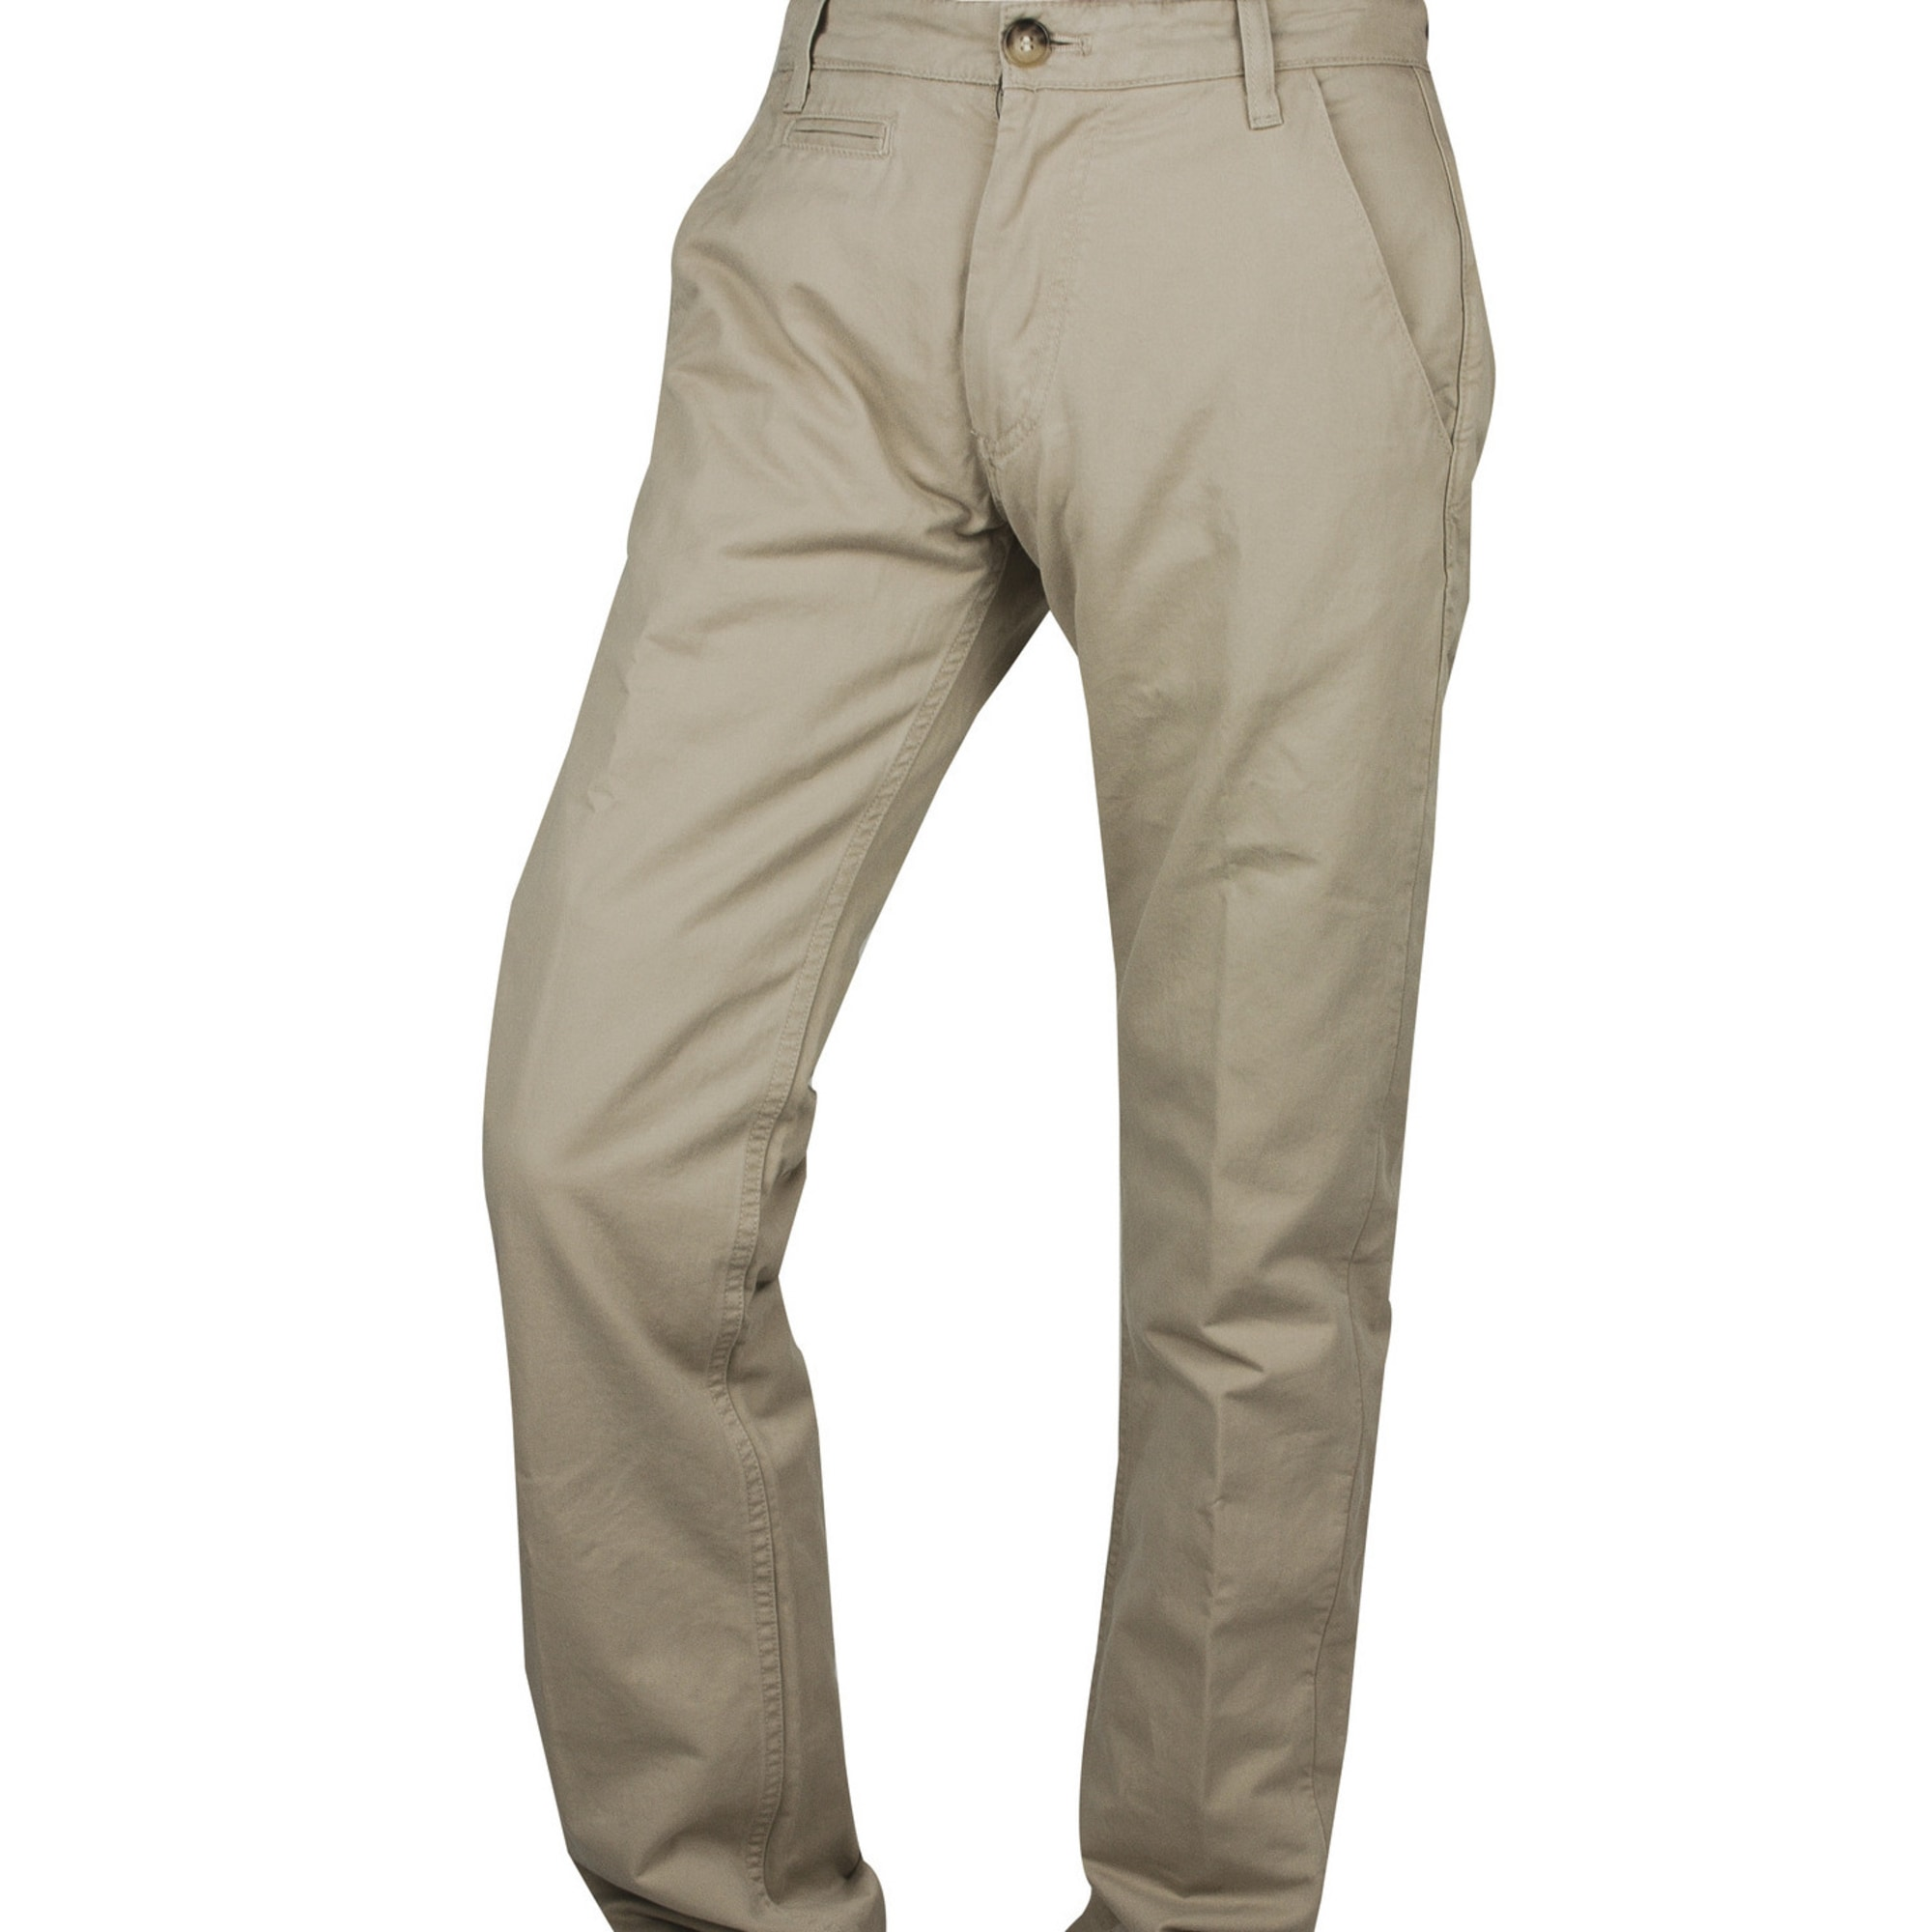 Pantalon droit ADIDAS Beige, camel